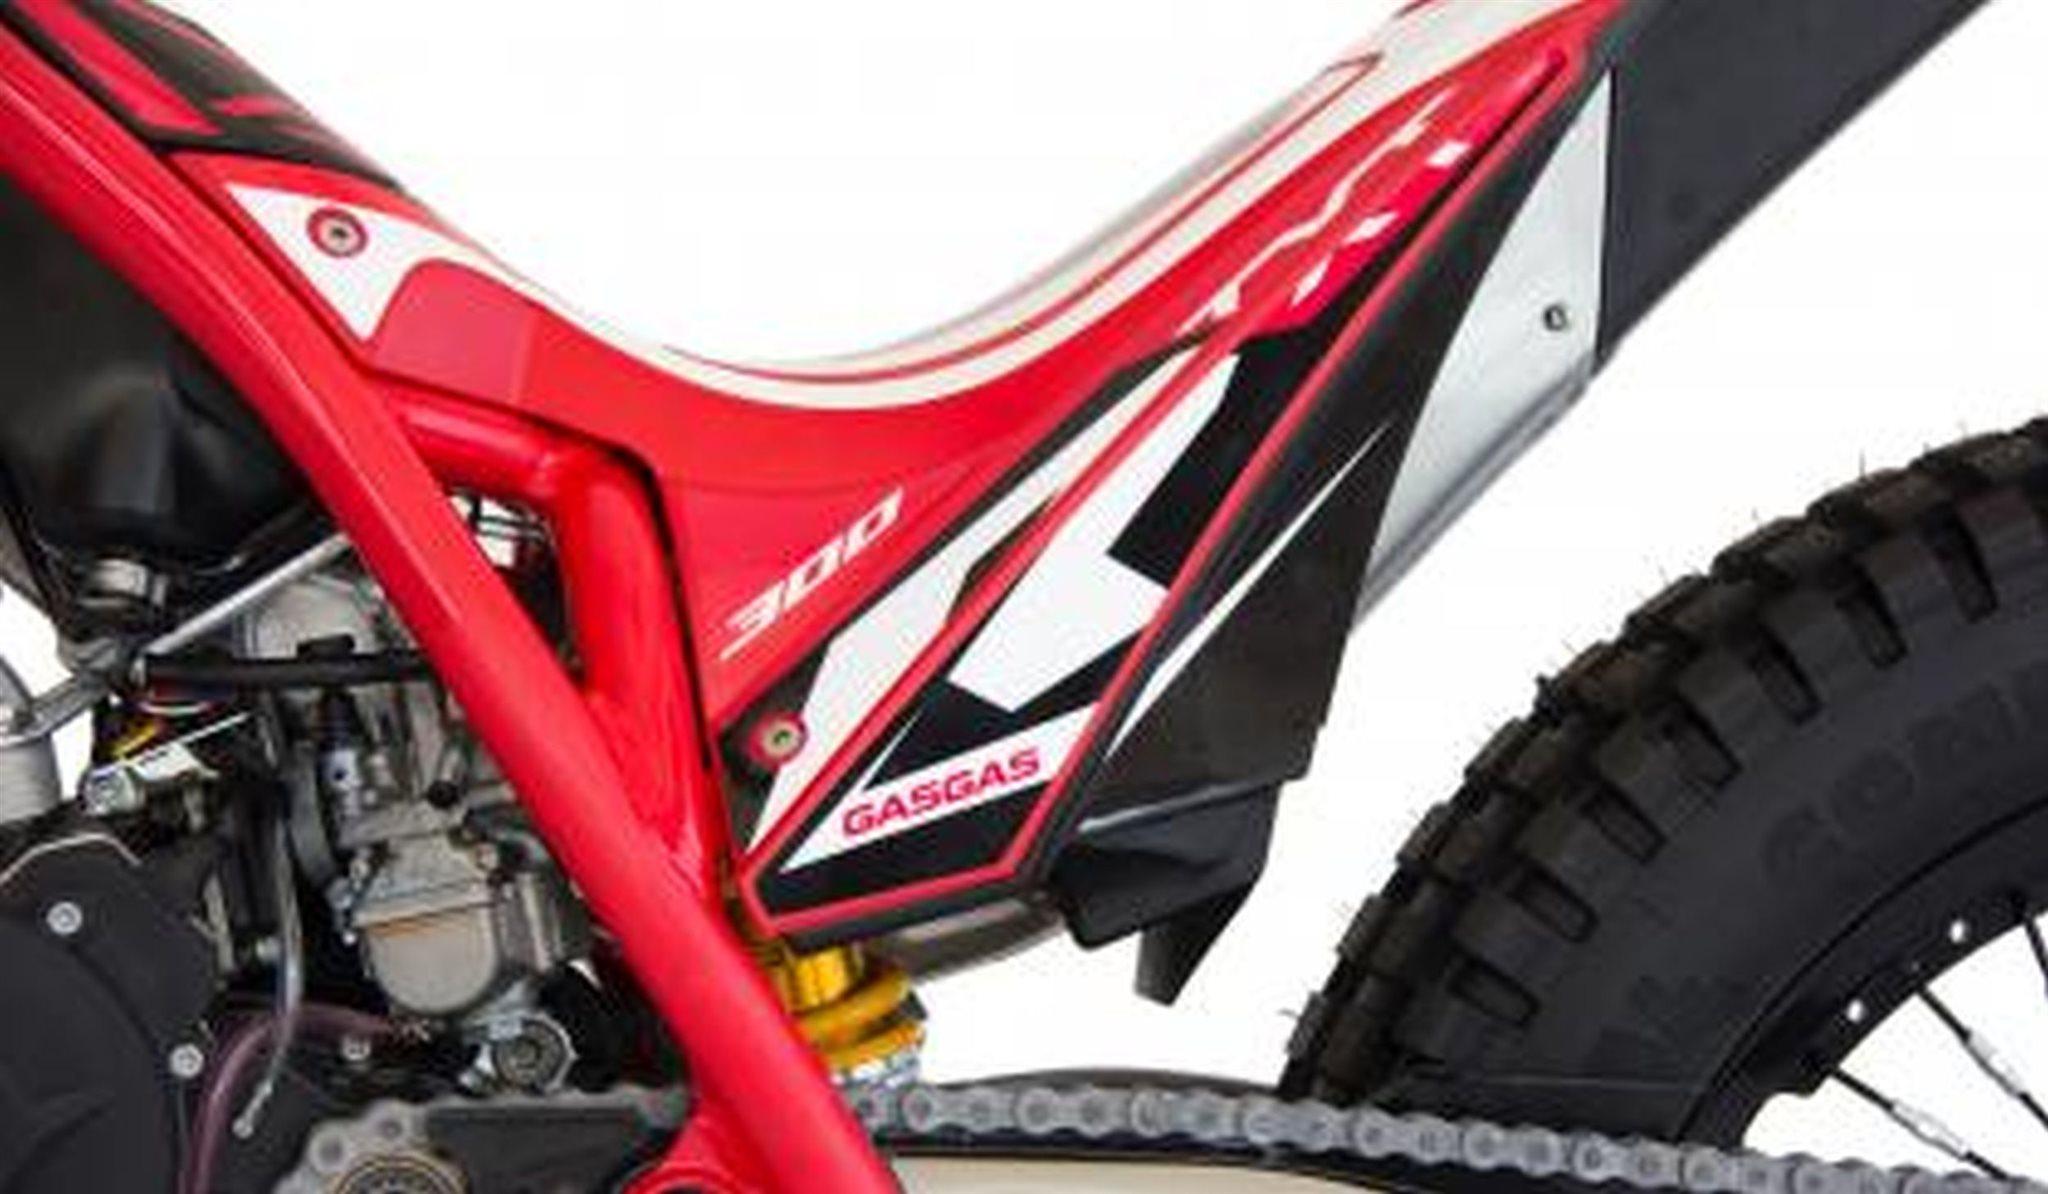 Gas Gas TXT Racing 300